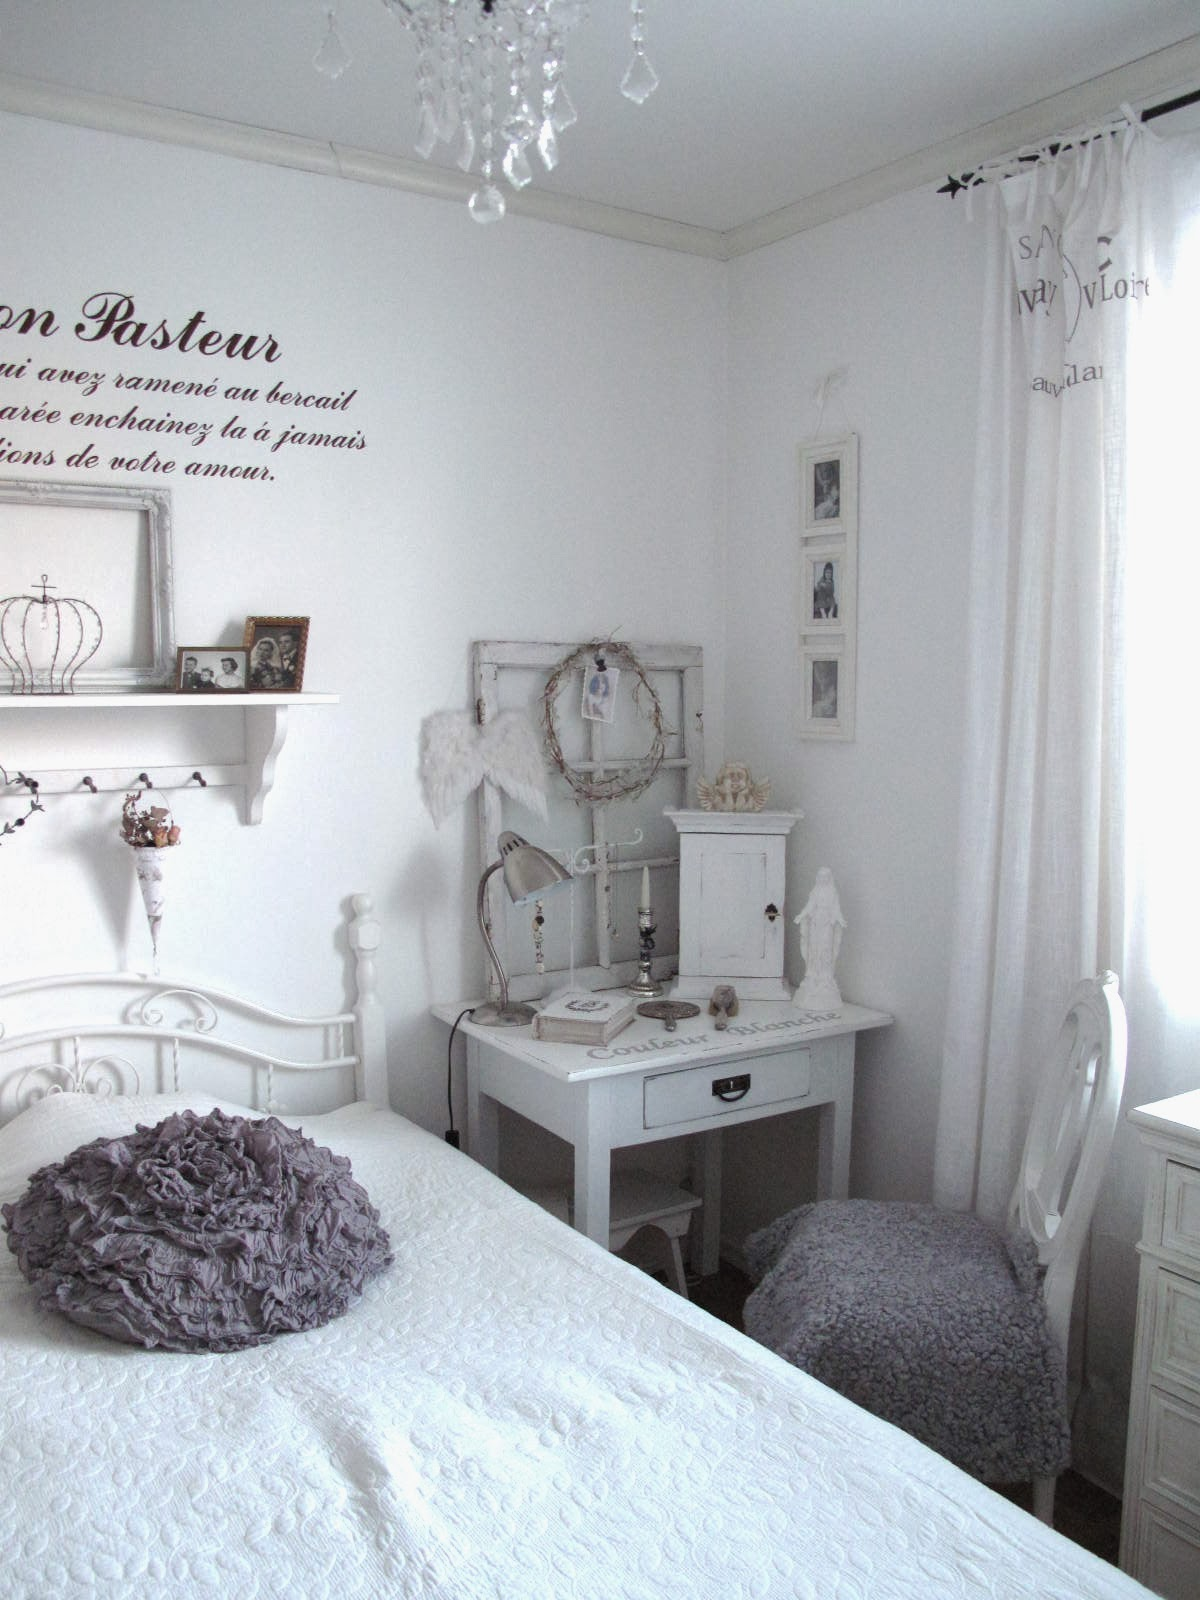 Tinis vita hem: sovrummet